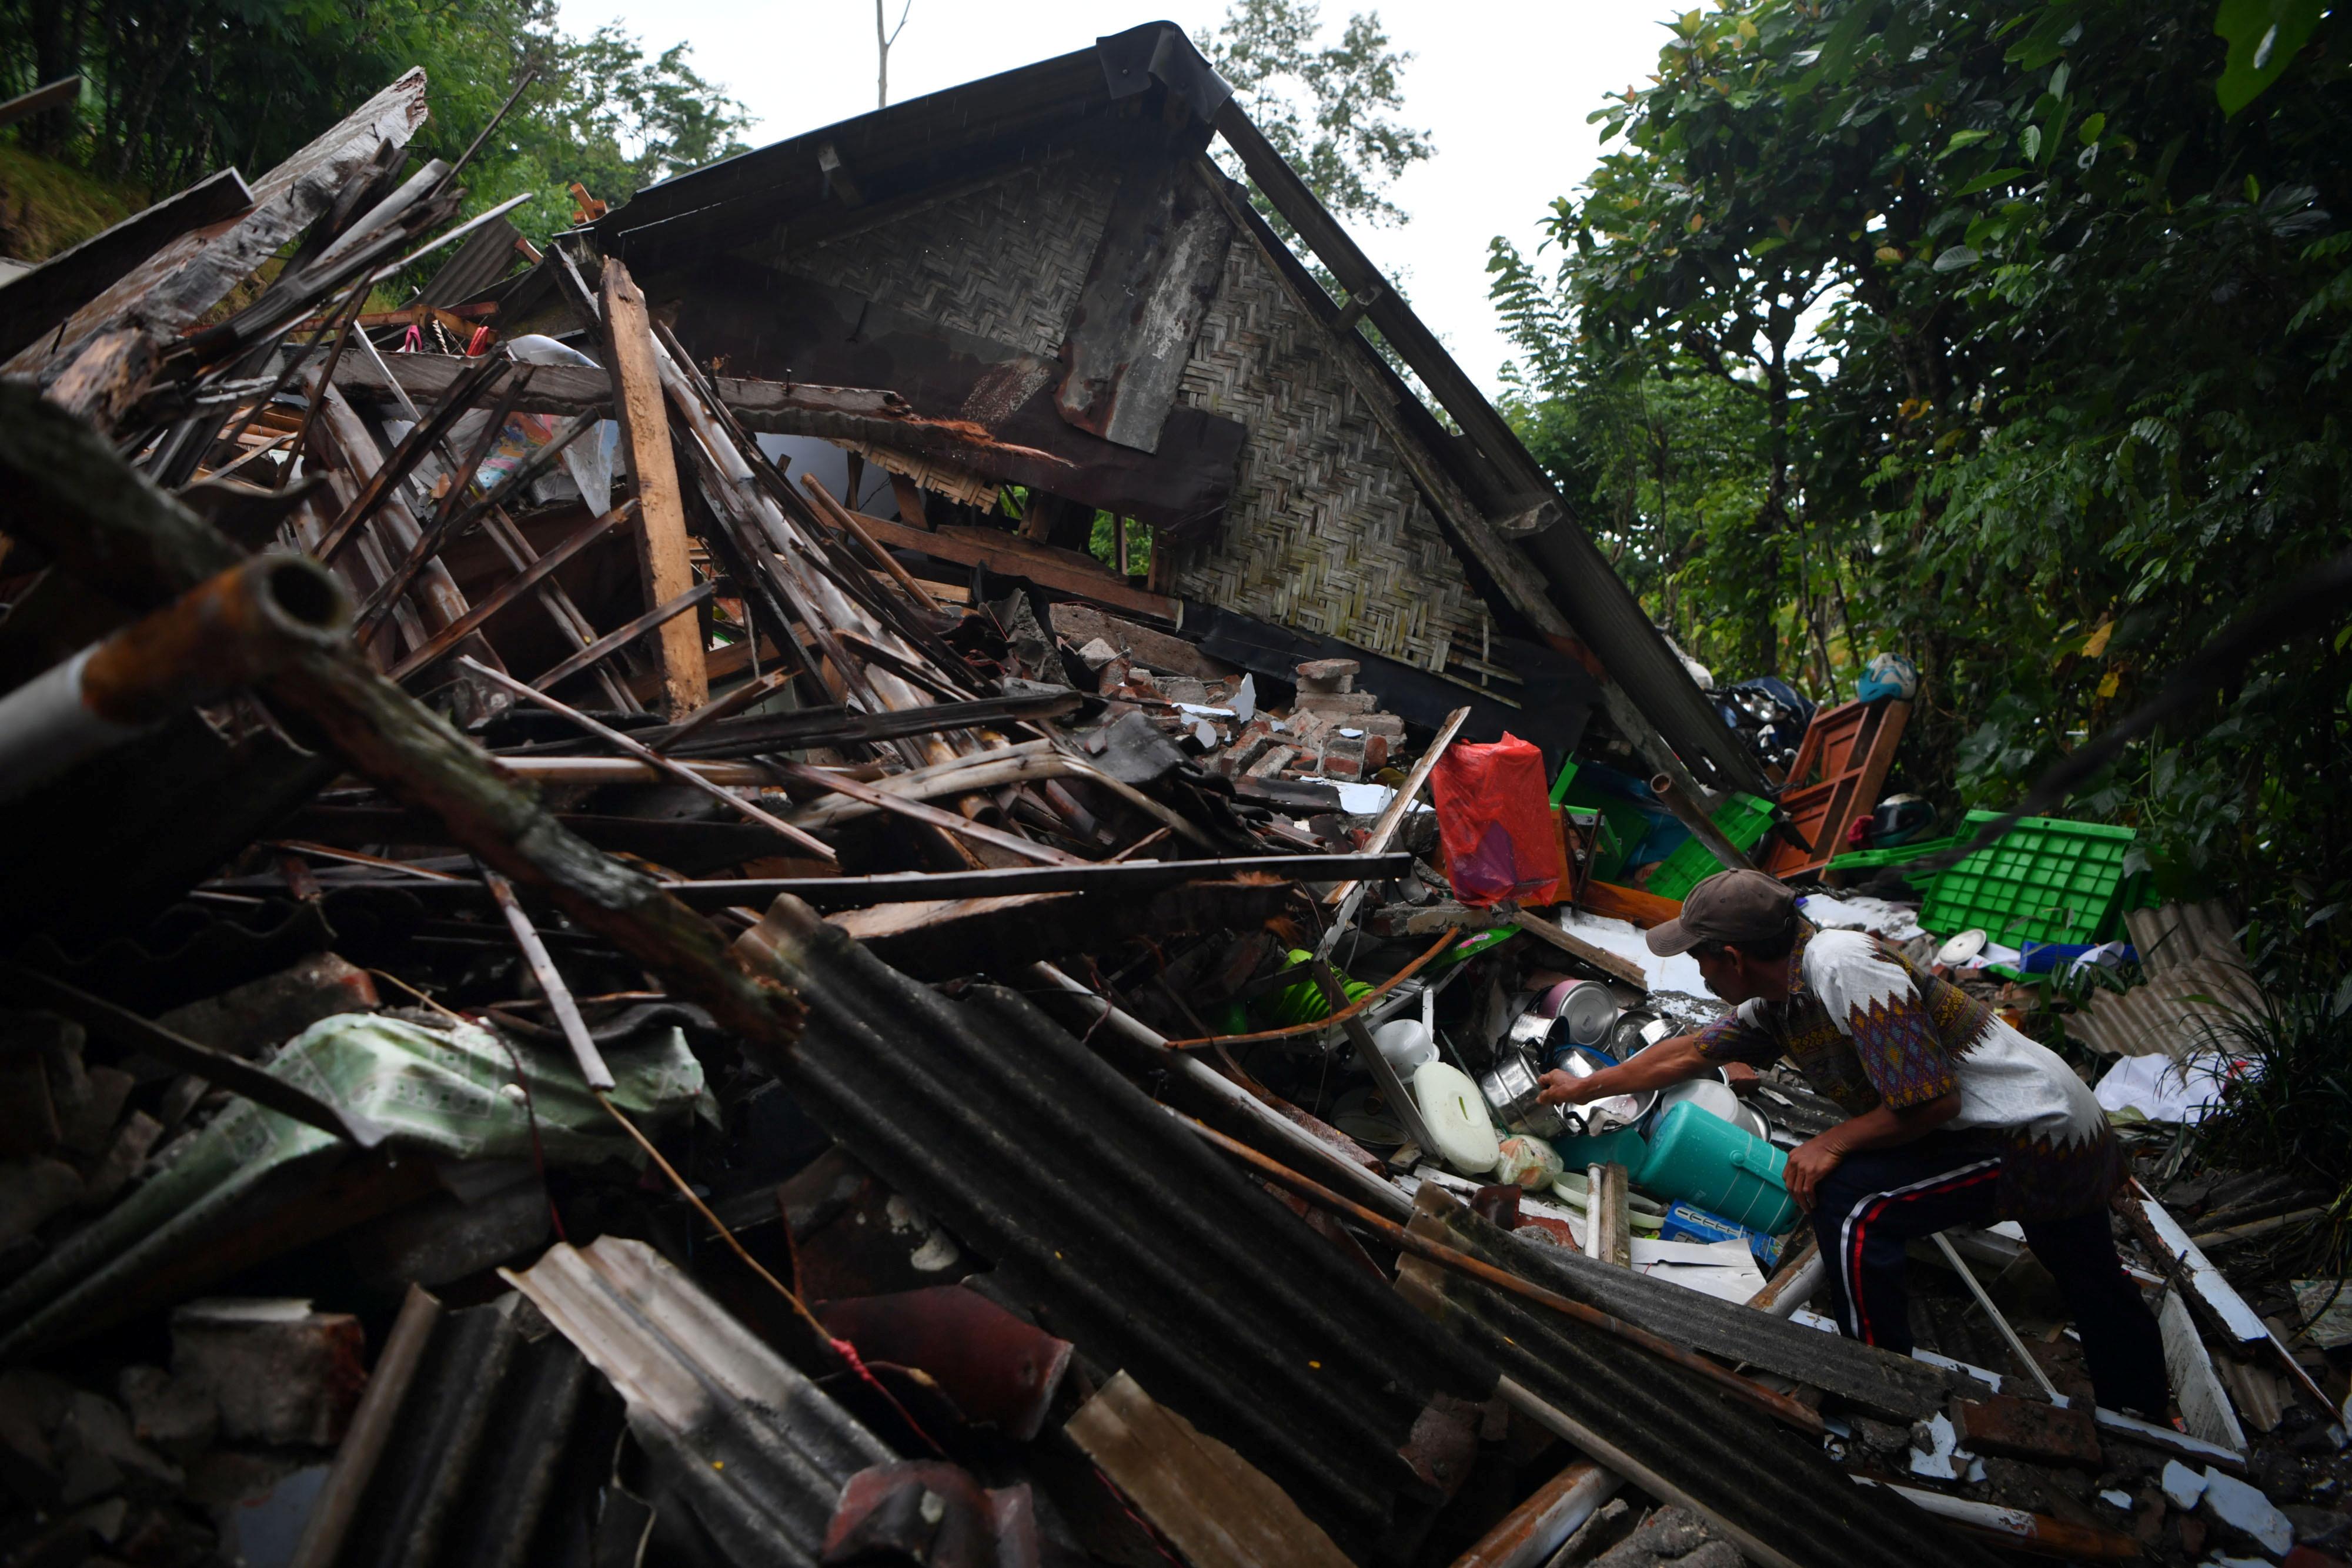 A man salvages his belongings at a house damaged by an earthquake in Lumajang, East Java province, Indonesia April 11, 2021, in this photo taken by Antara Foto. Antara Foto/Zabur Karuru/via REUTERS